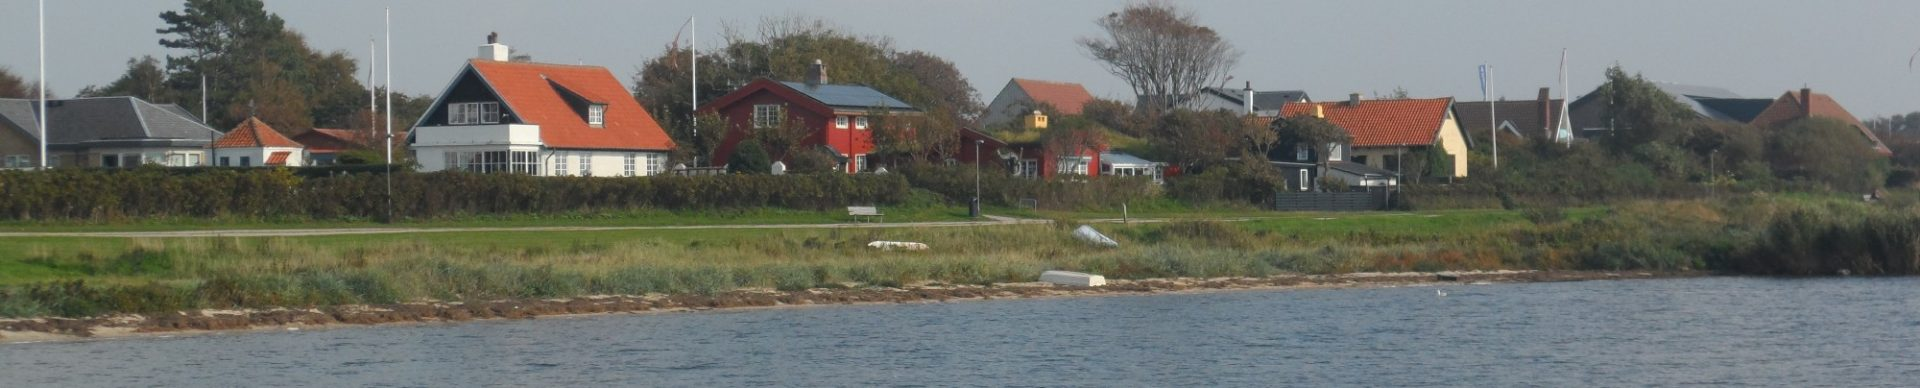 Ringkøbing Lokalhistoriske Arkiv